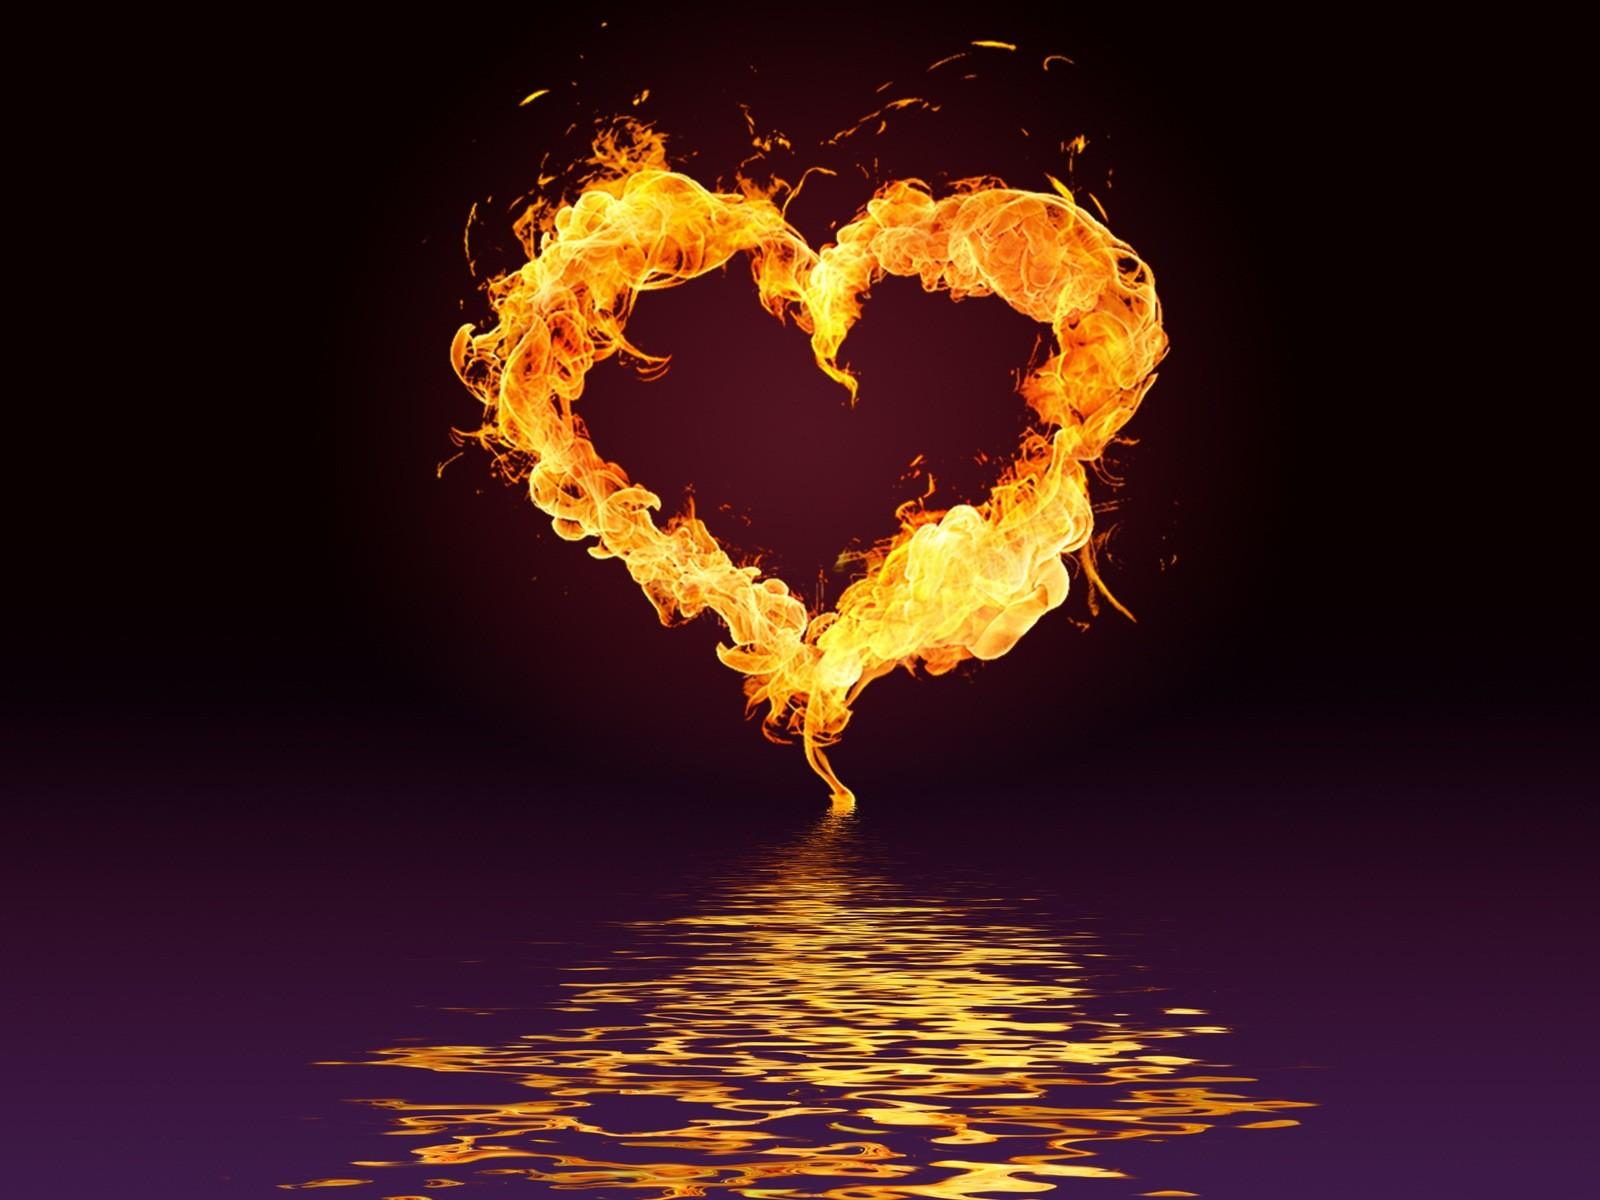 Сердце любовь картинка